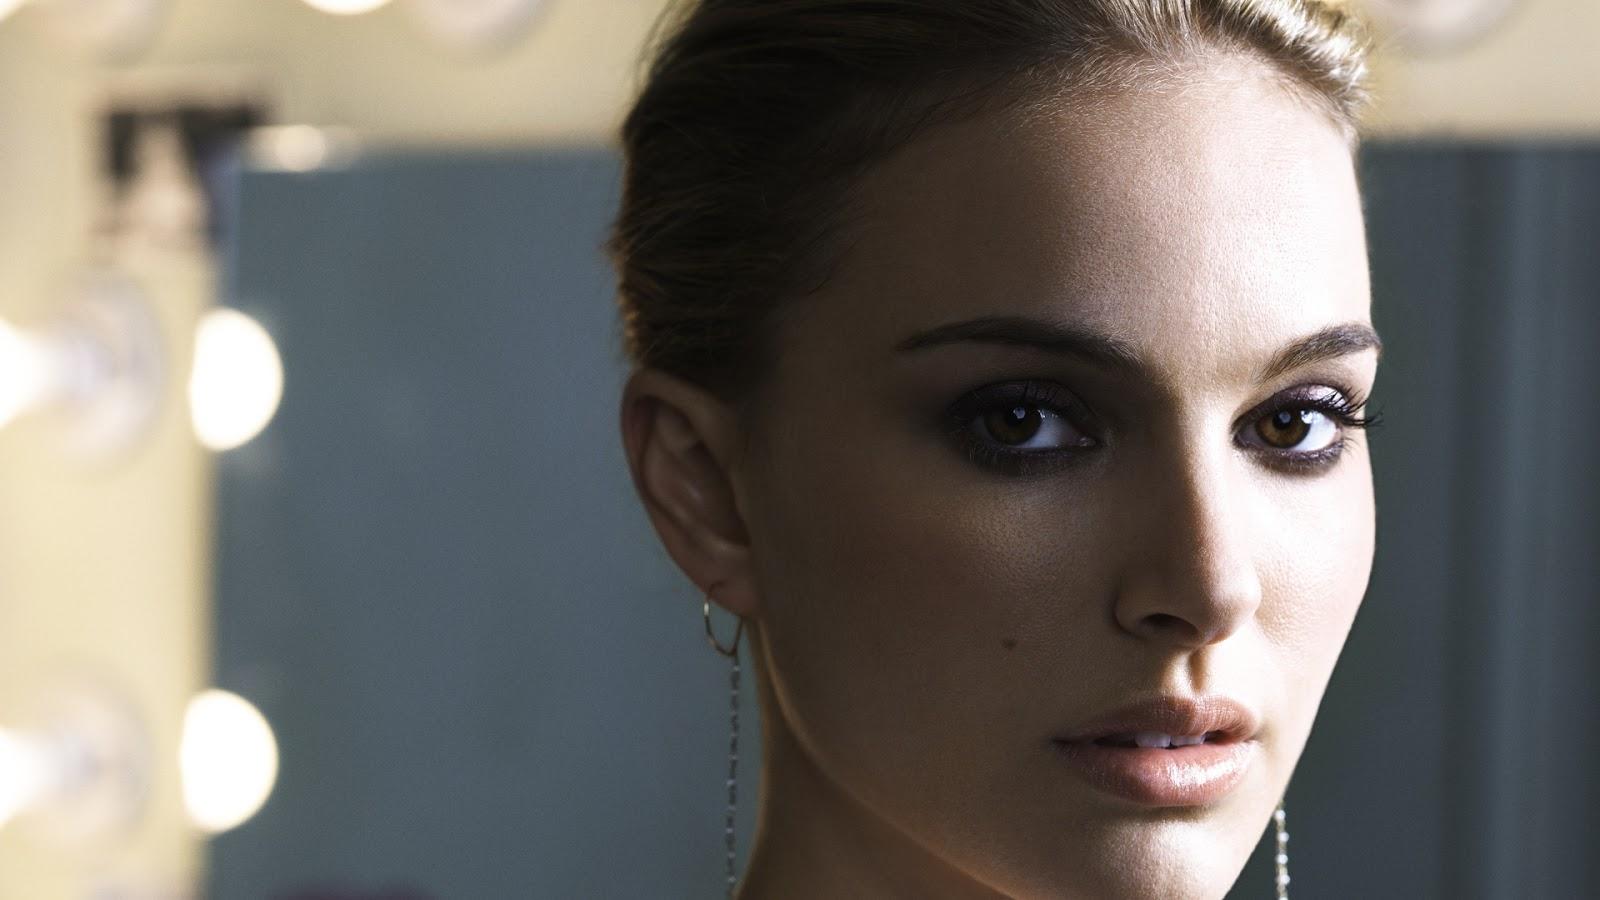 Natalie Portman Beautiful Eyes Wallpaper